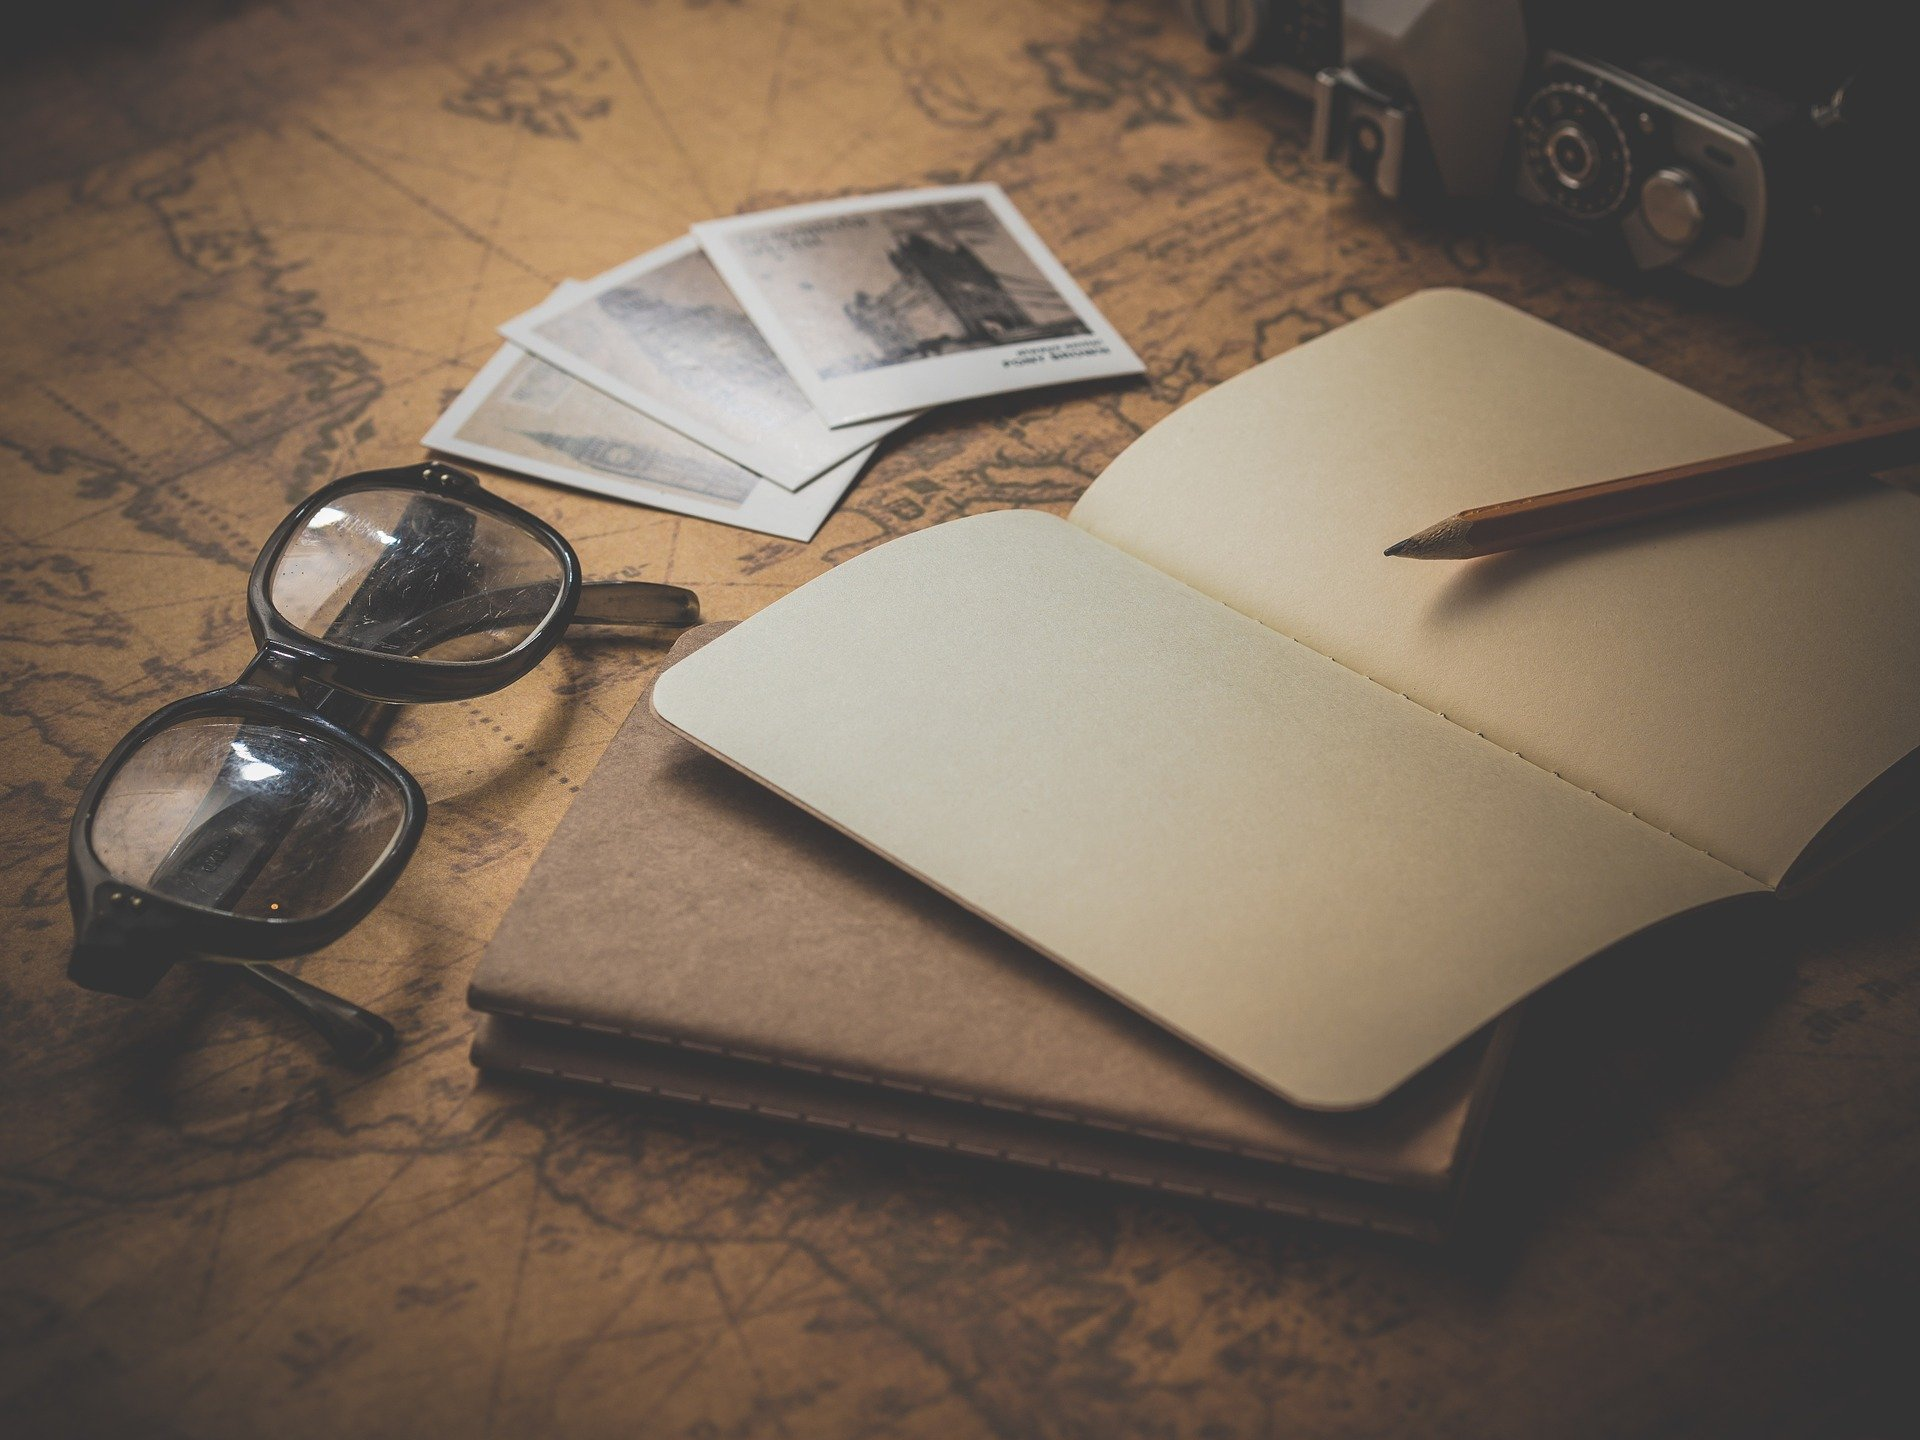 dissertation writing help services